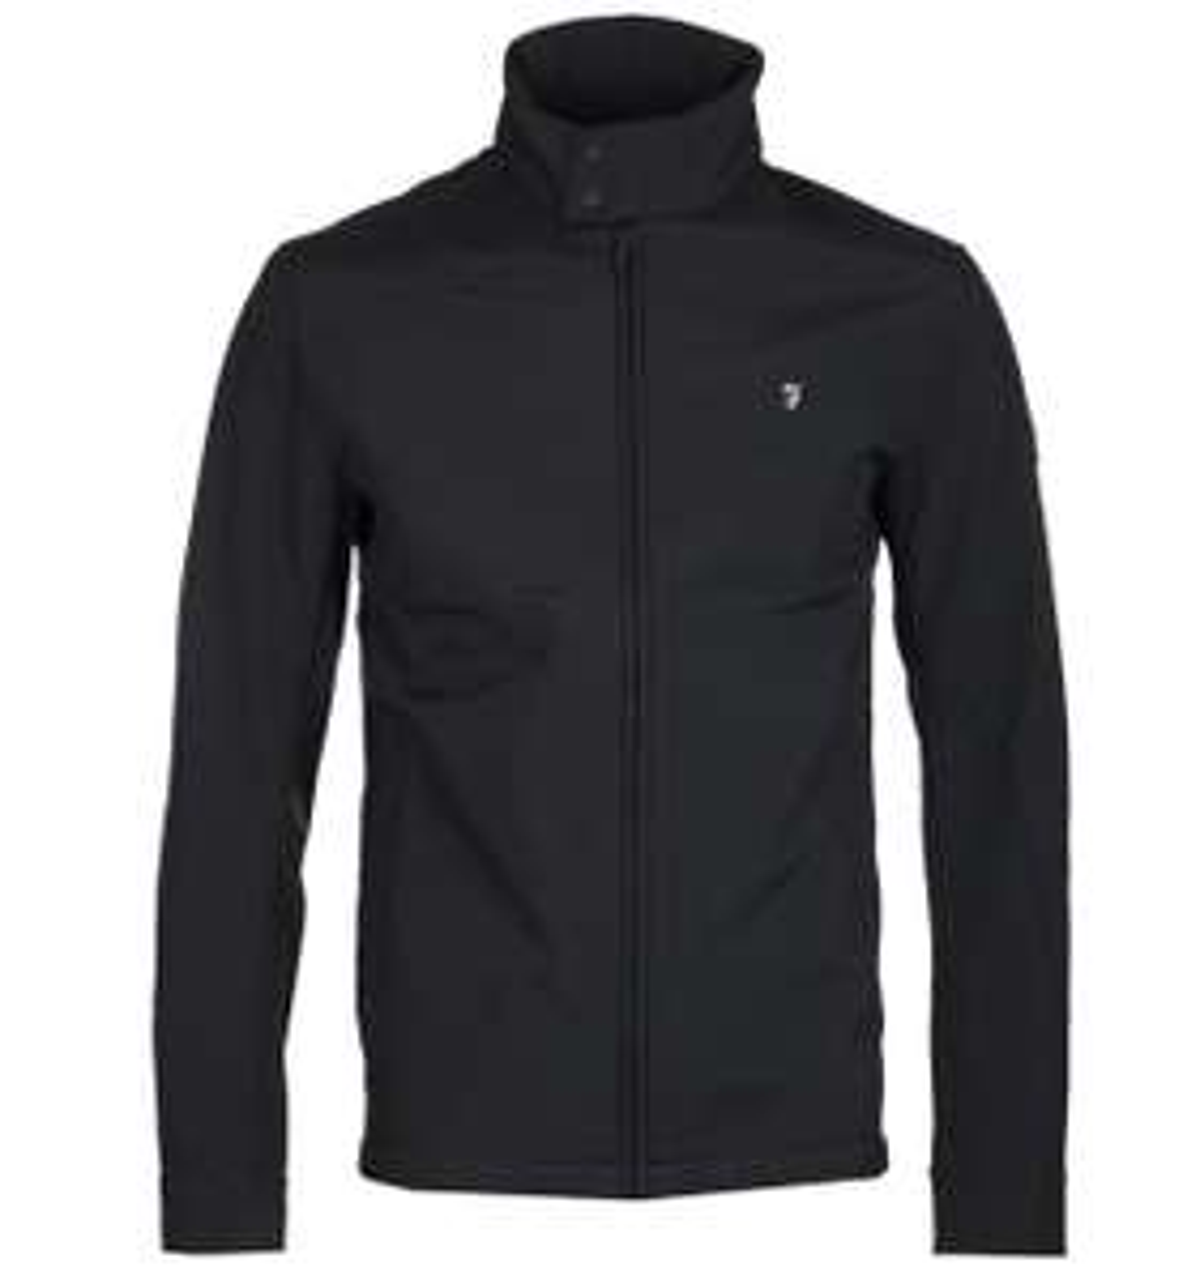 Farah Cormack Blouson Deep Black Zip Jacket £32.95 delivered at Brown Bag Clothing